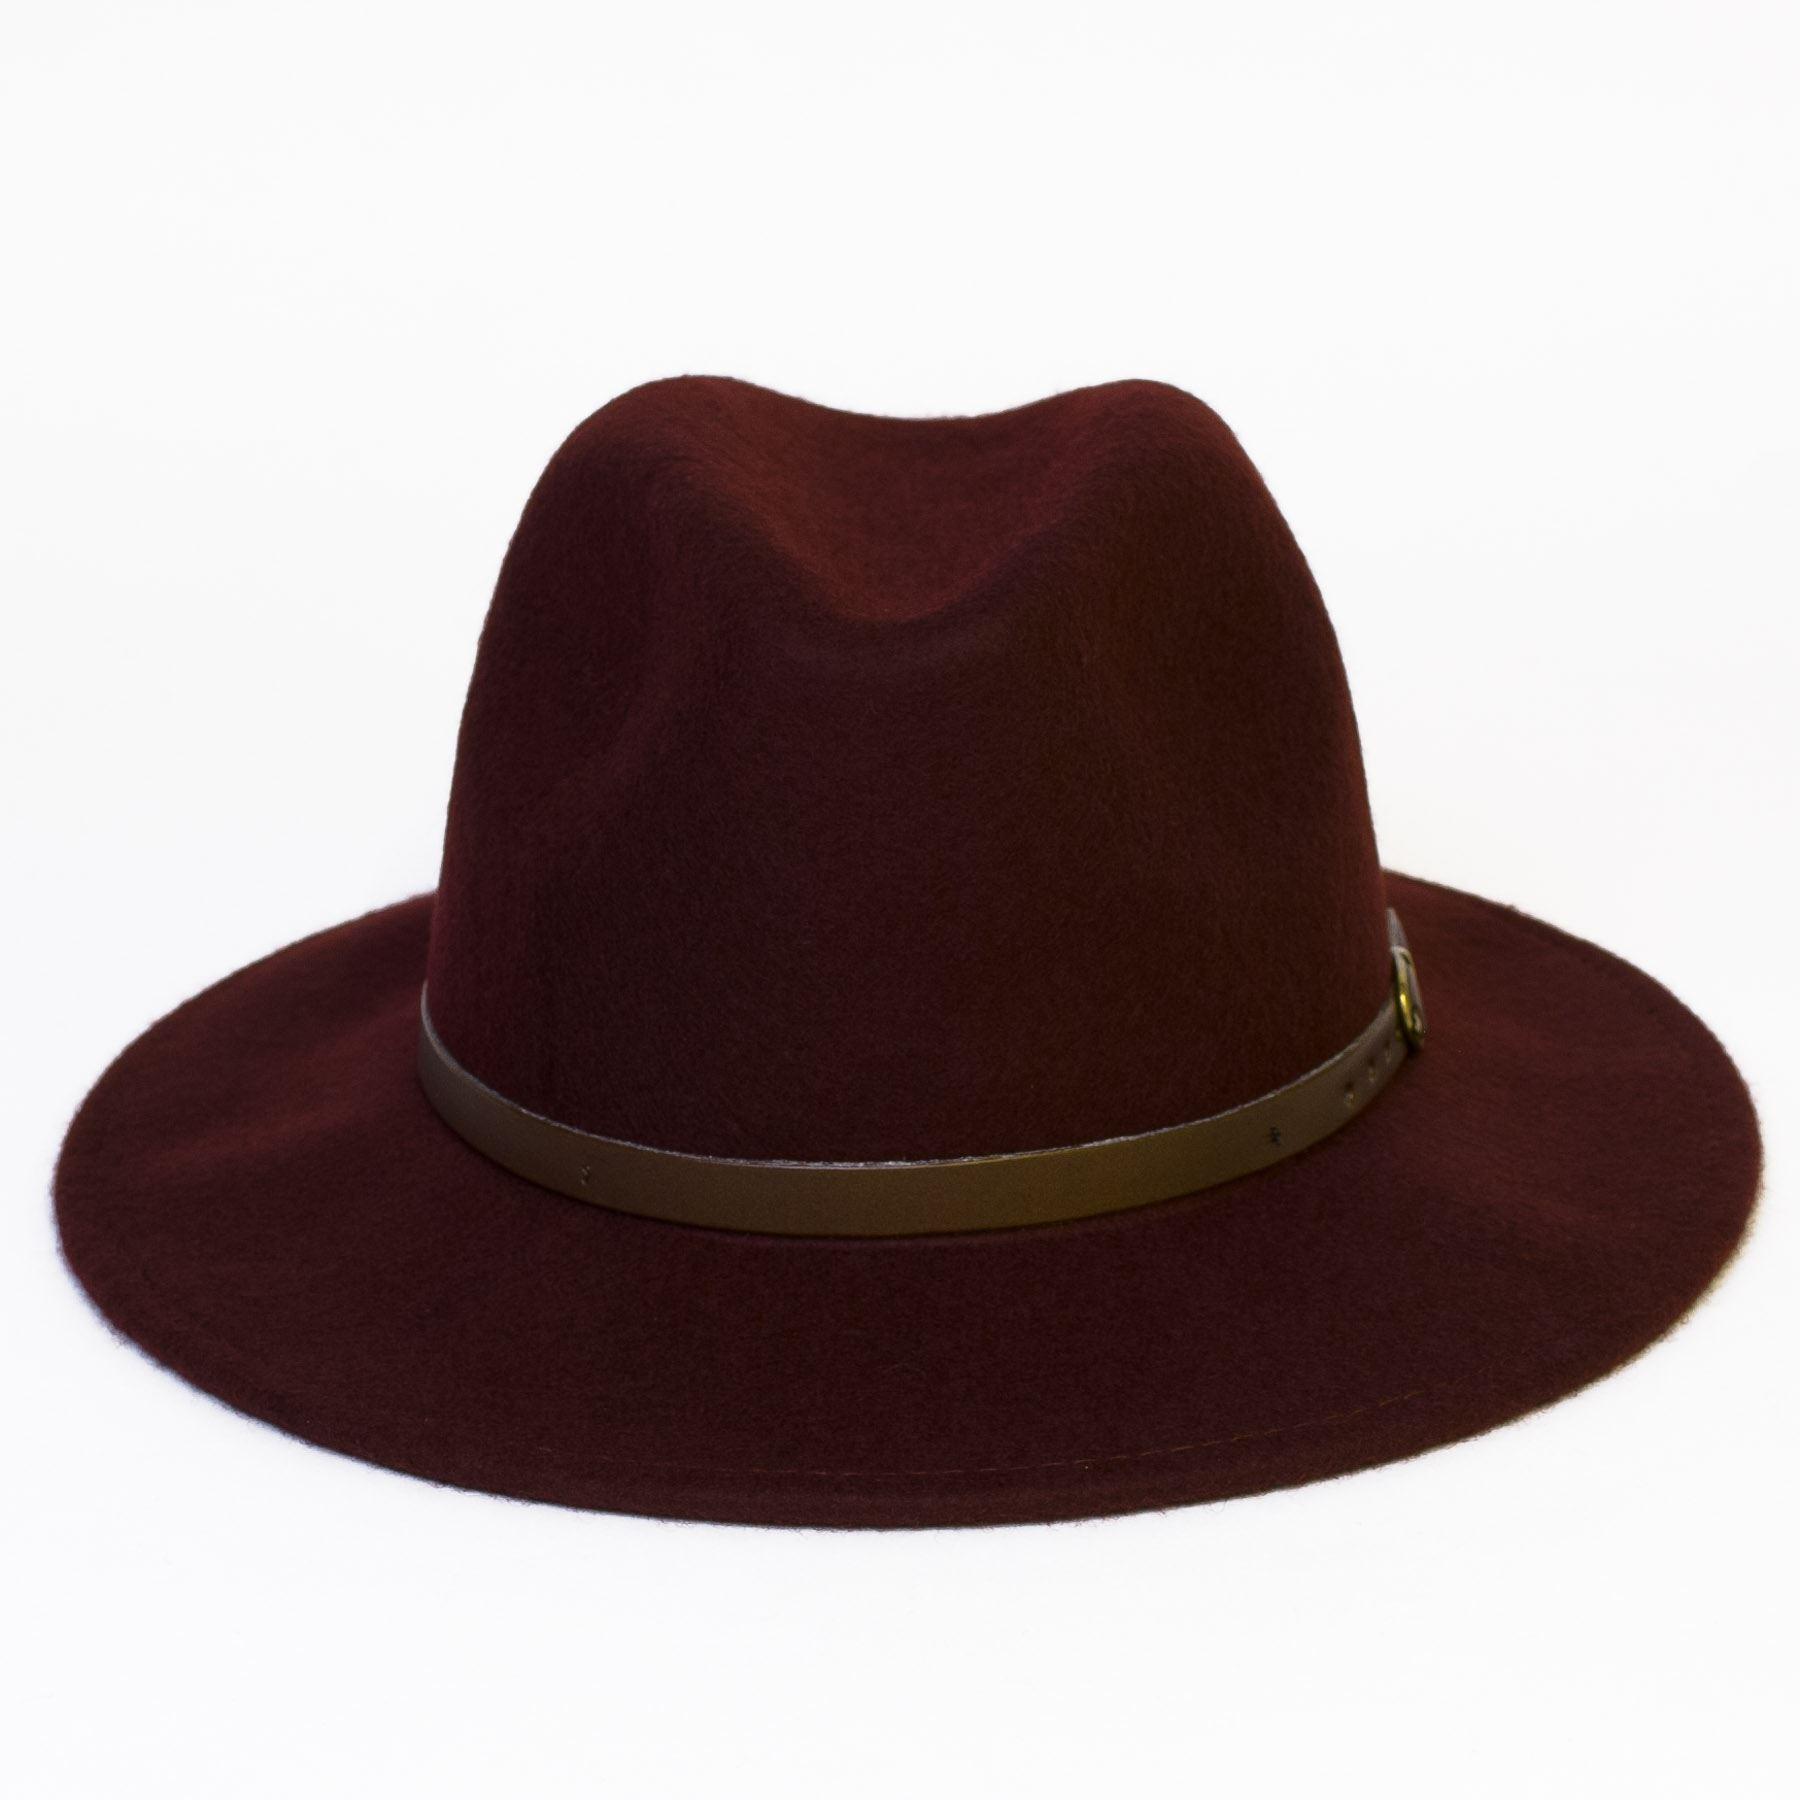 Cappello Fedora in Feltro  be9888f2df80